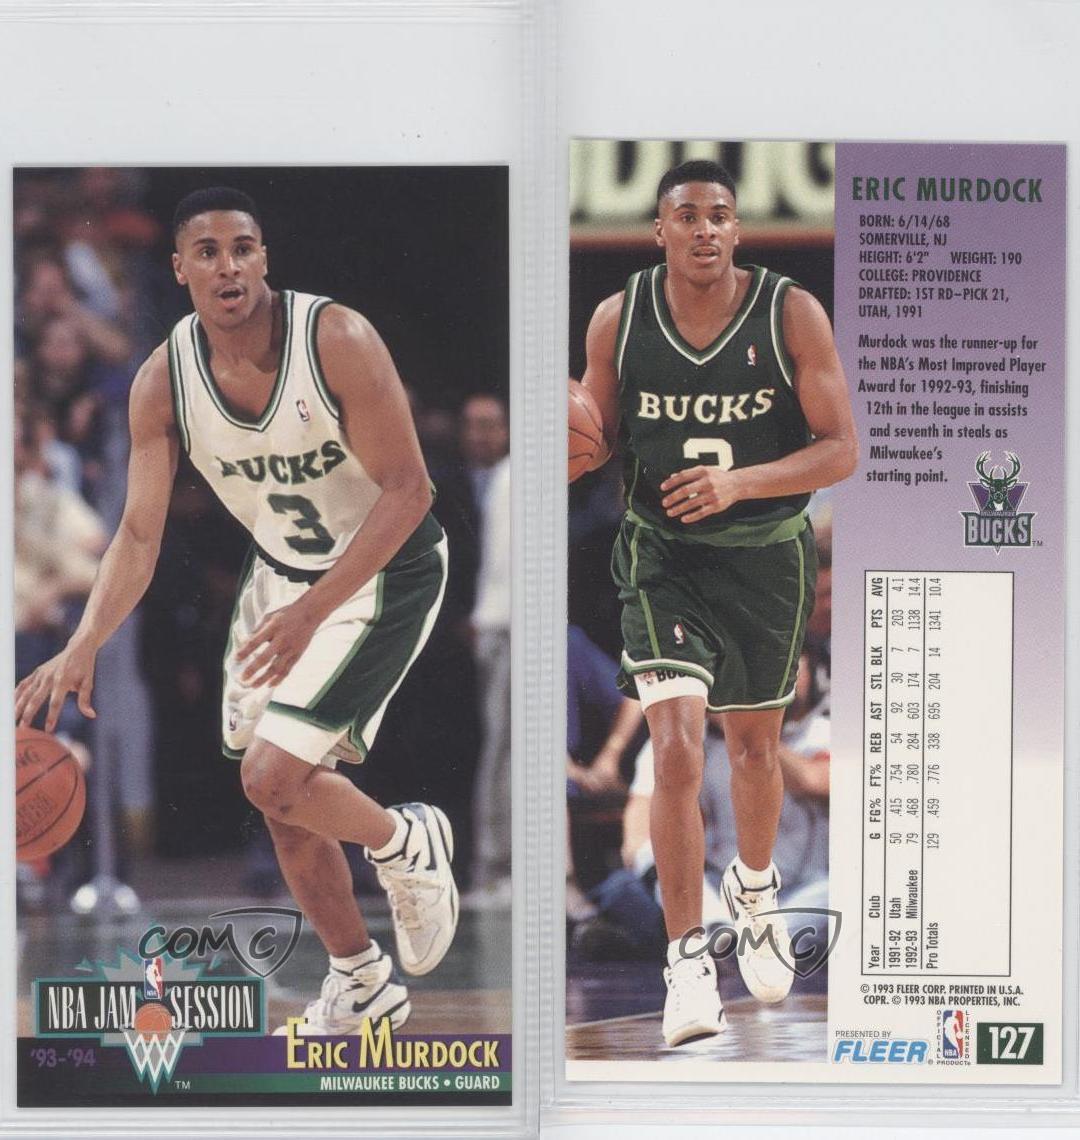 1993-94 NBA Jam Session #127 Eric Murdock Milwaukee Bucks